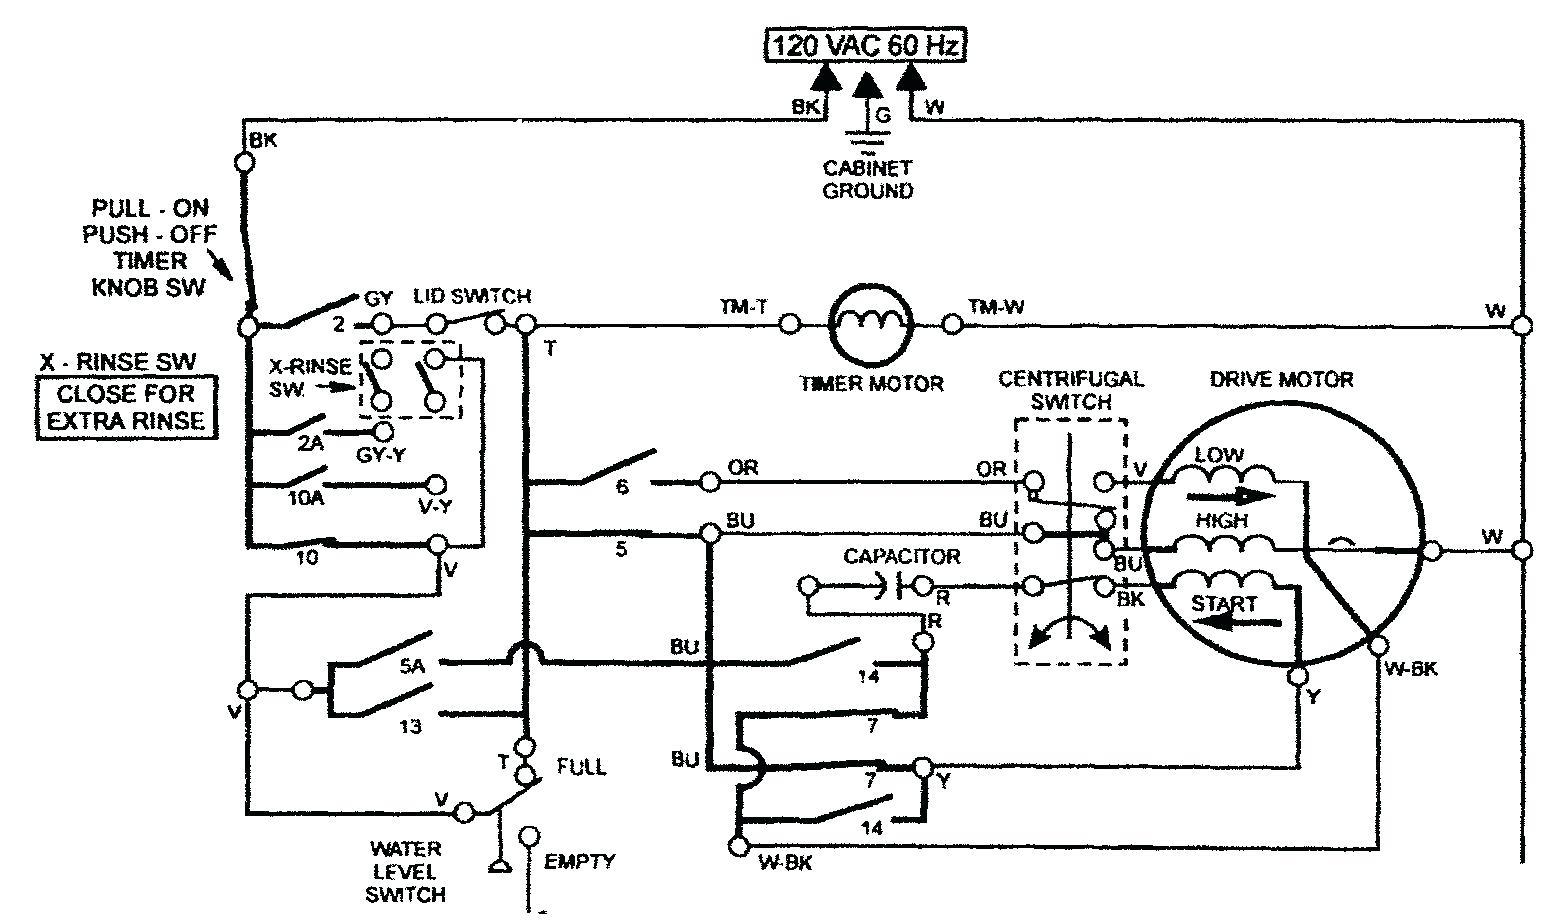 Ge Washer Wiring Schematic Jeep Grand Wagoneer Wiring Harness Dodyjm Nescafe Jeanjaures37 Fr